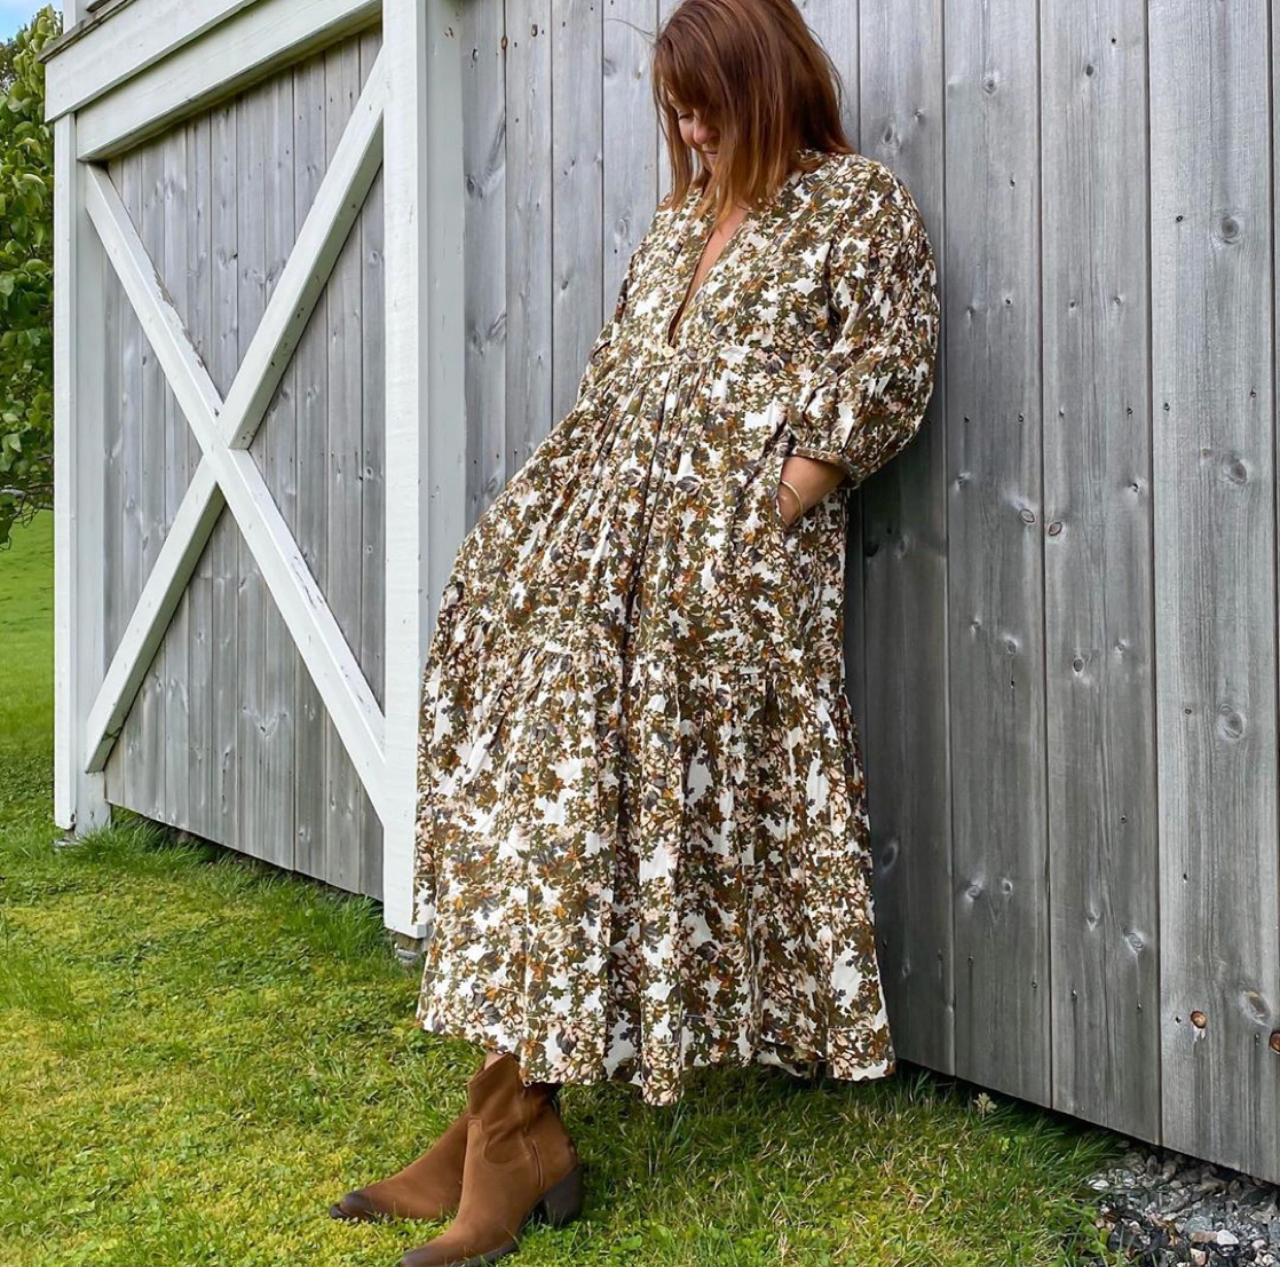 Structured cotton dress